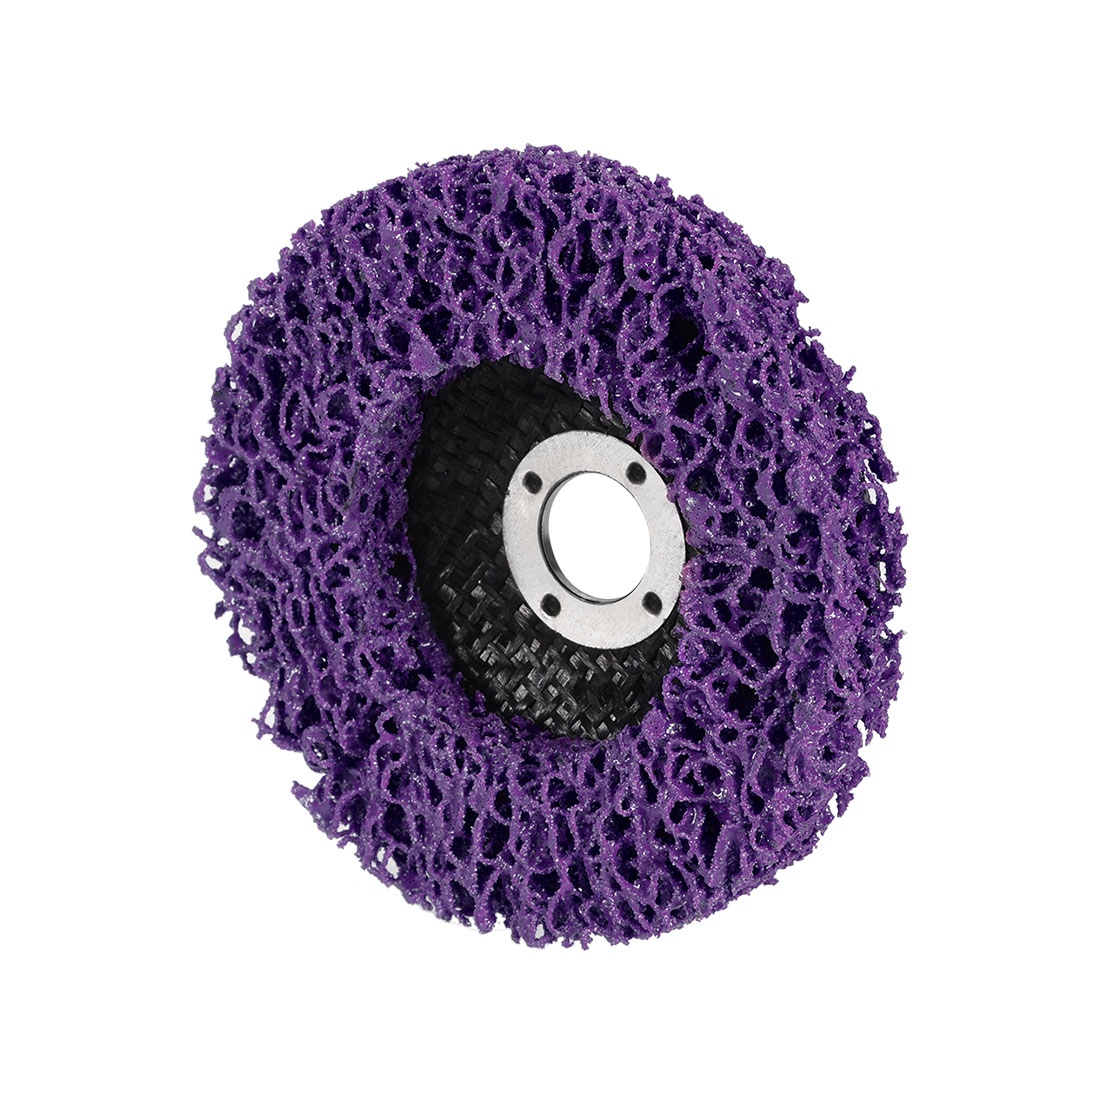 4 Inch Nylon Polishing Wheel Buffing Pad Felt Disc Purple